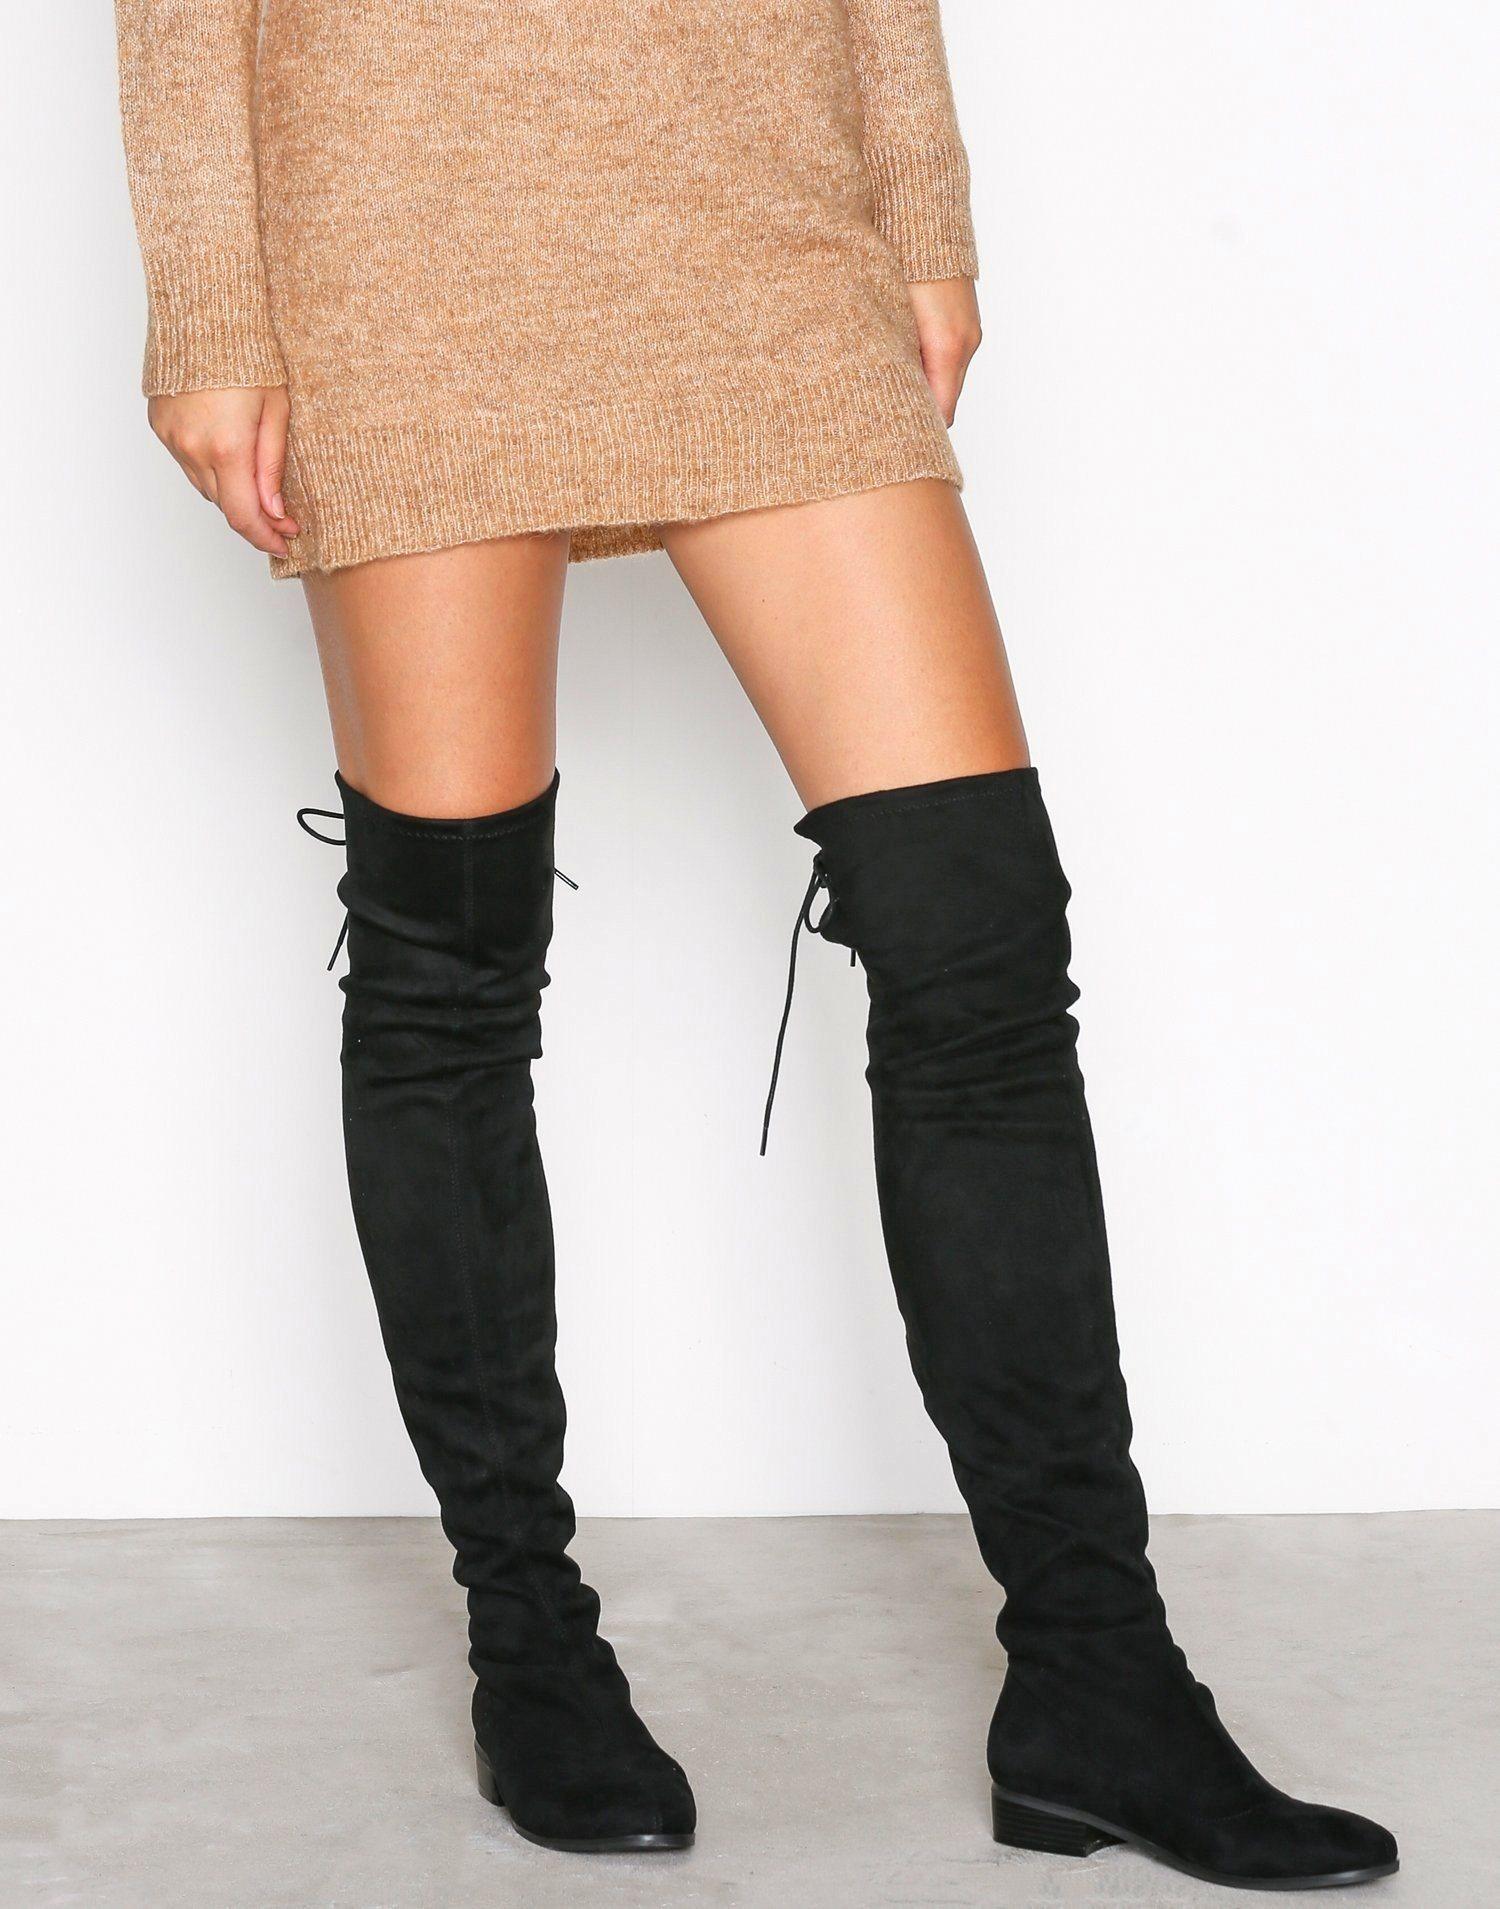 Nelly thigh high boots svarta overknee stövlar .. (337295064) ᐈ Köp ... 0f3391a1fdebb